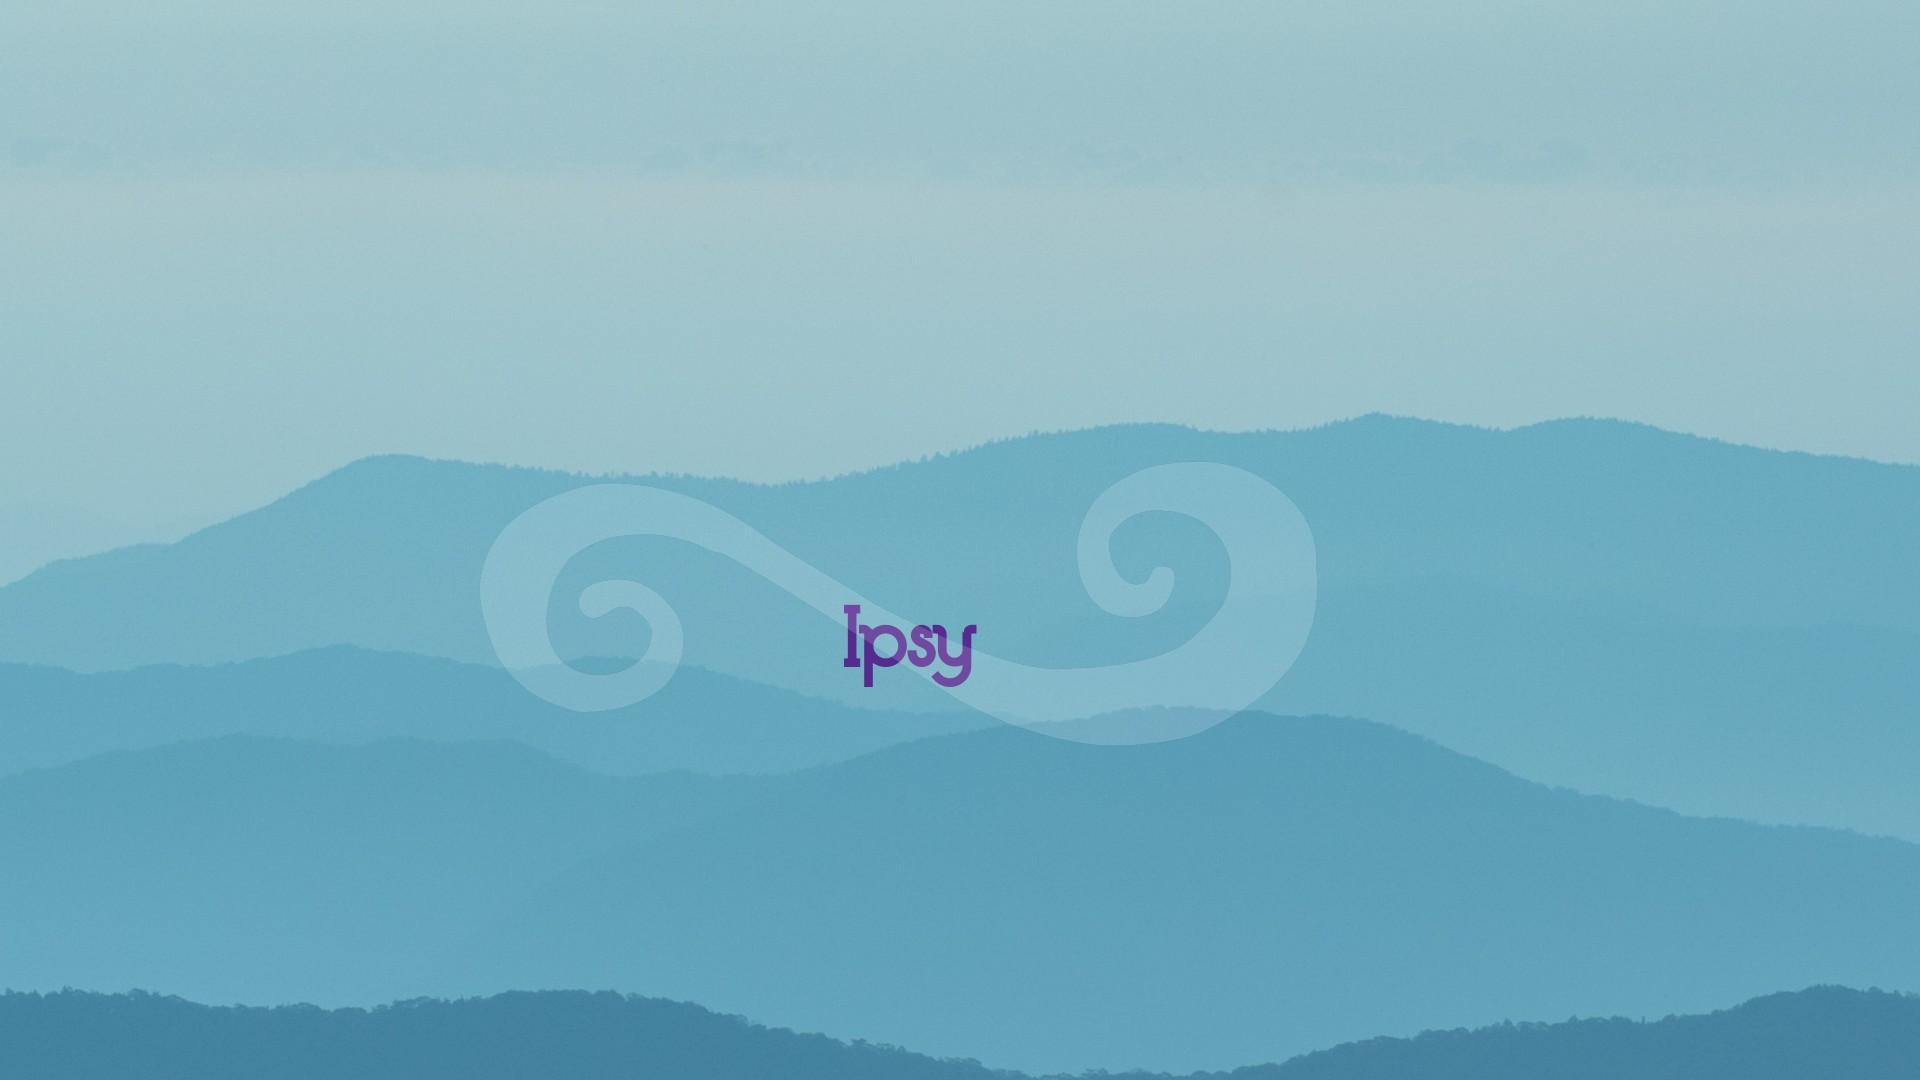 Ipsy Subscription- Is it Worth it?